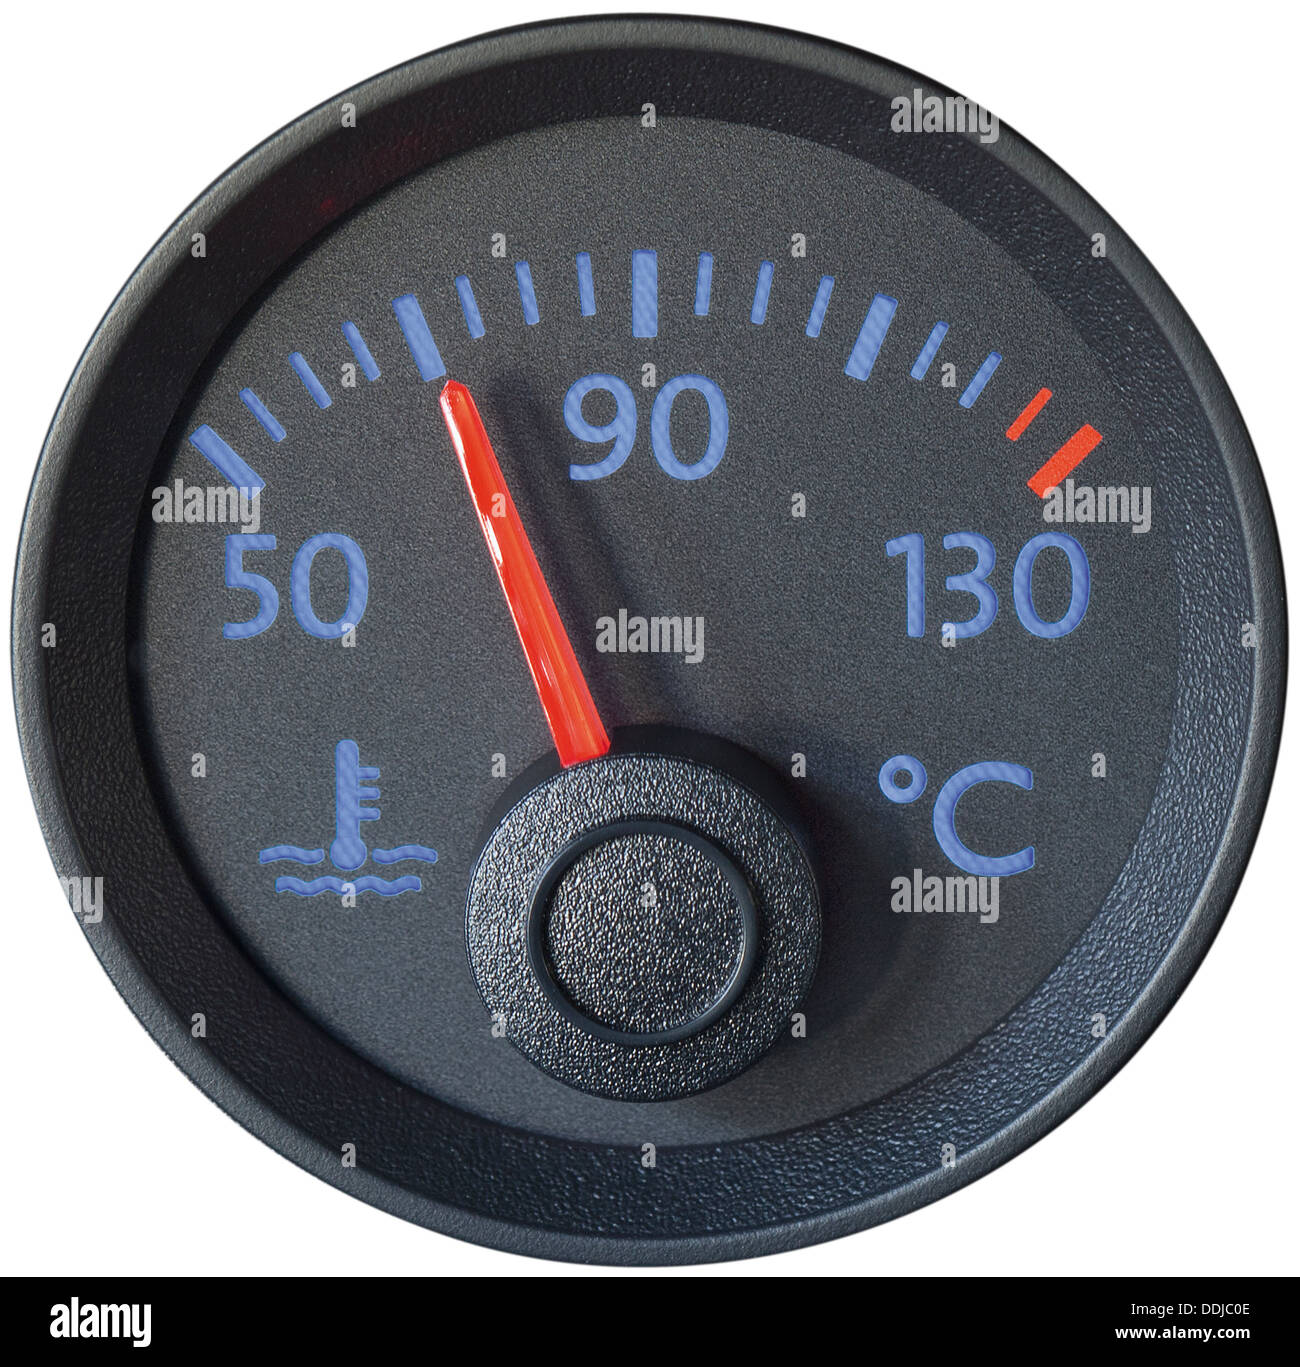 Vehicle dashboard on white background, close up - Stock Image